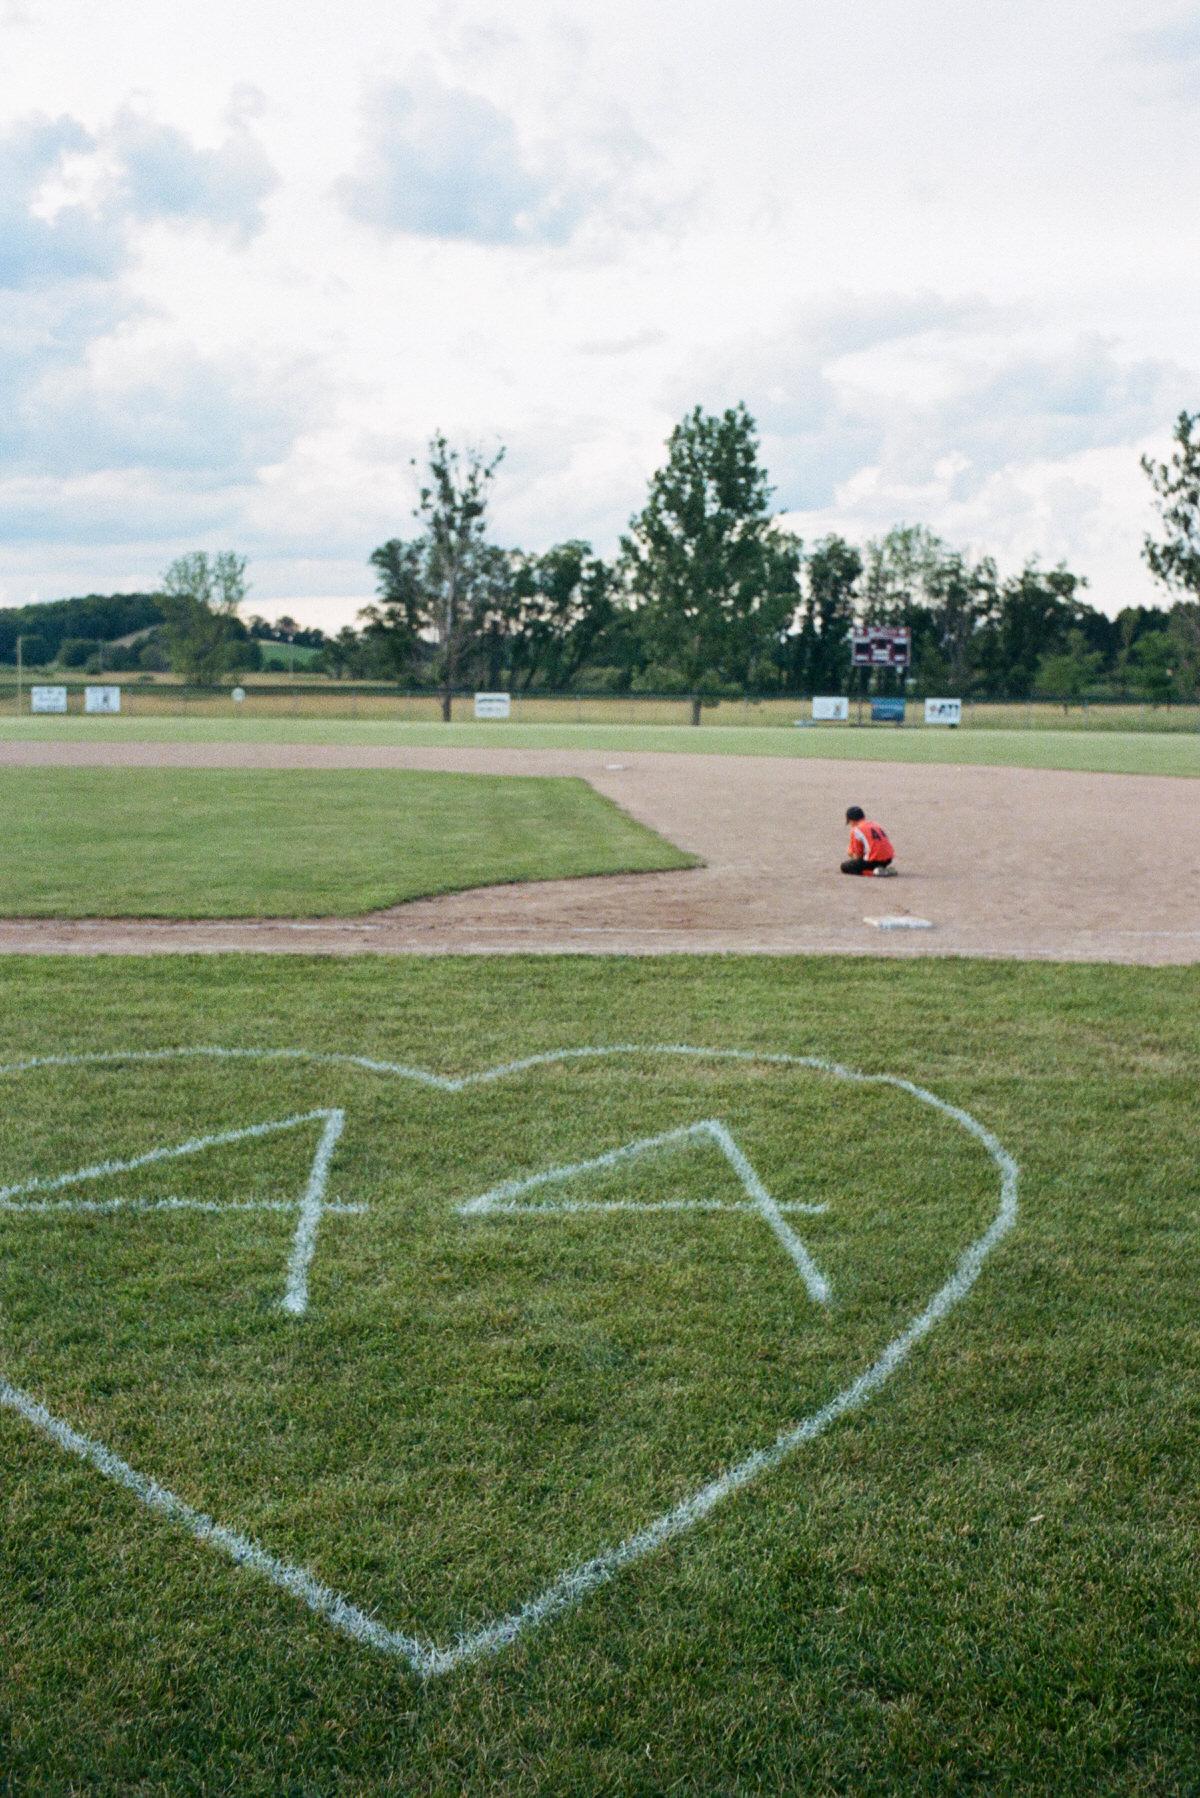 Club-44-Mount-Calvary-Athletic-Club-Wisconsin-fine-art--film-photography-by-Studio-L-artist-photographer-Laura-Schneider-_029B